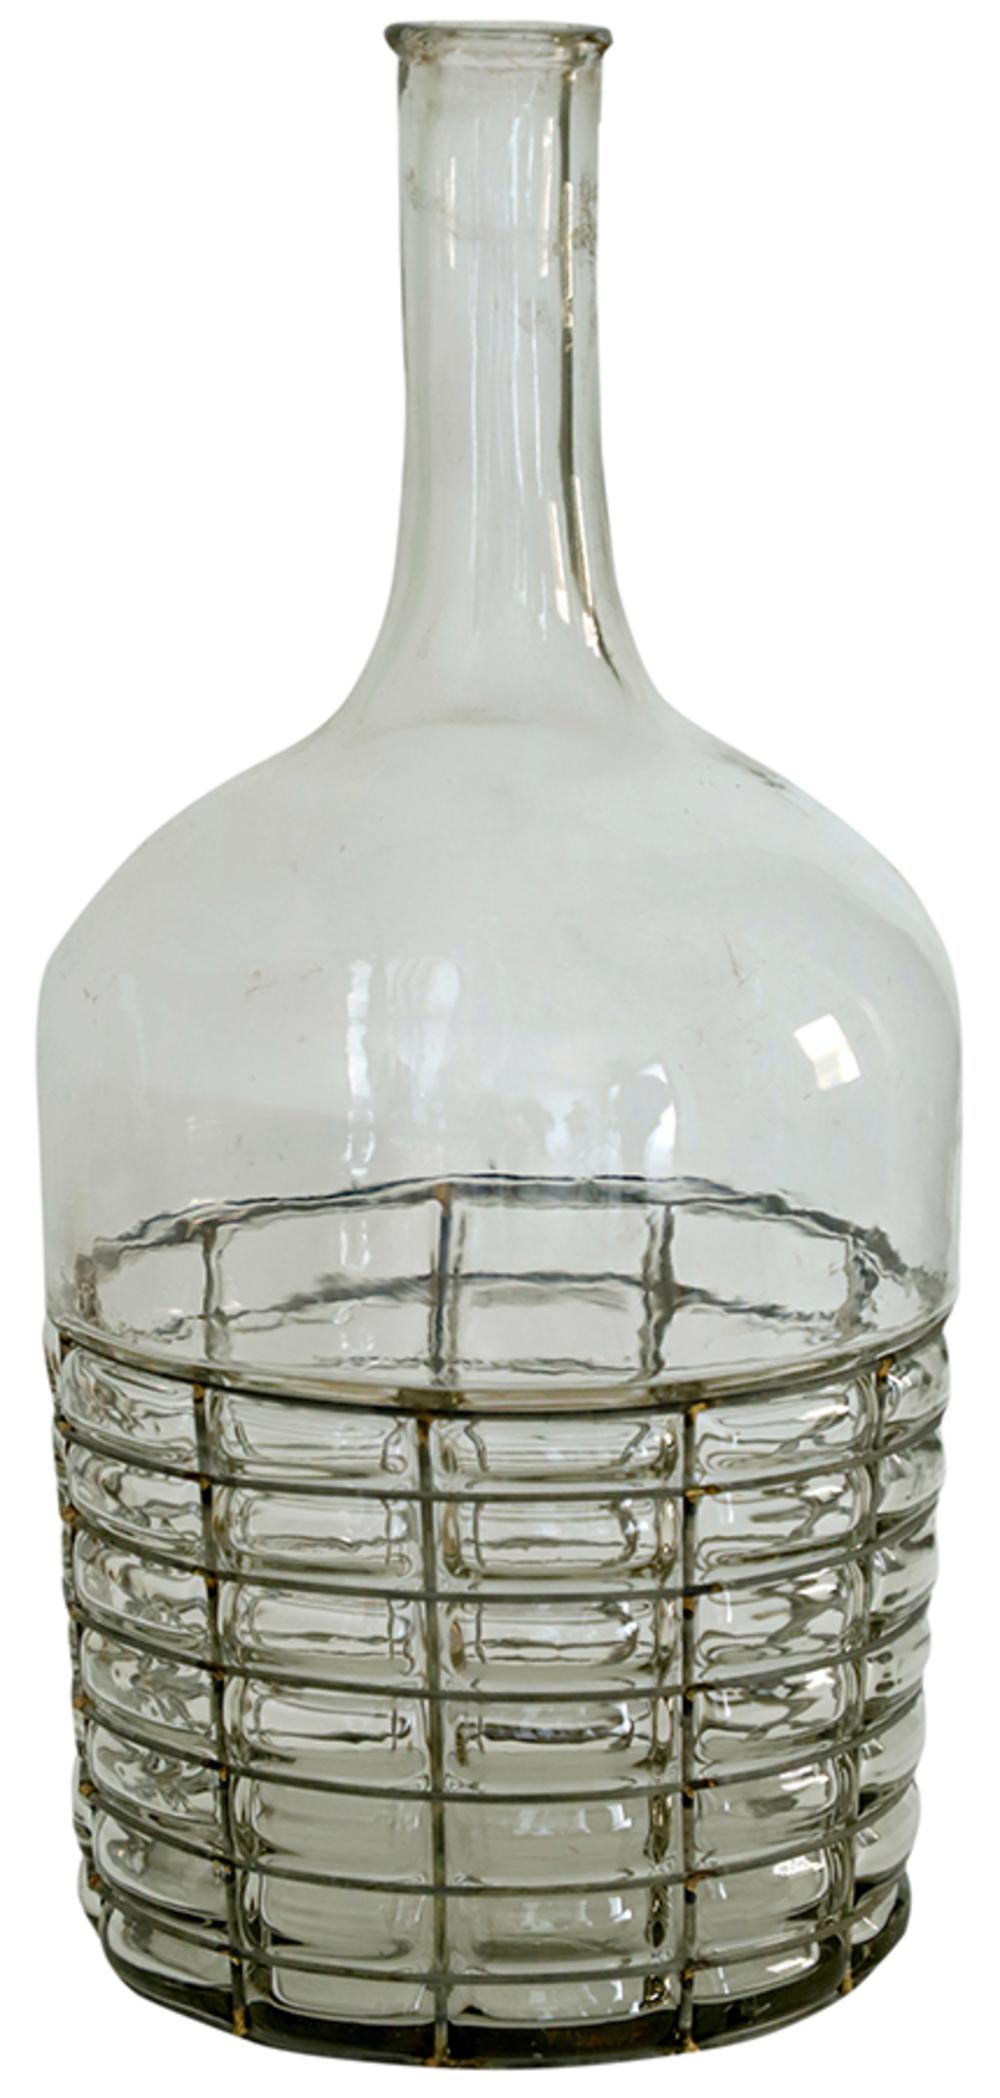 Dovetail Furniture - Glass Decorative Bottle/Vase